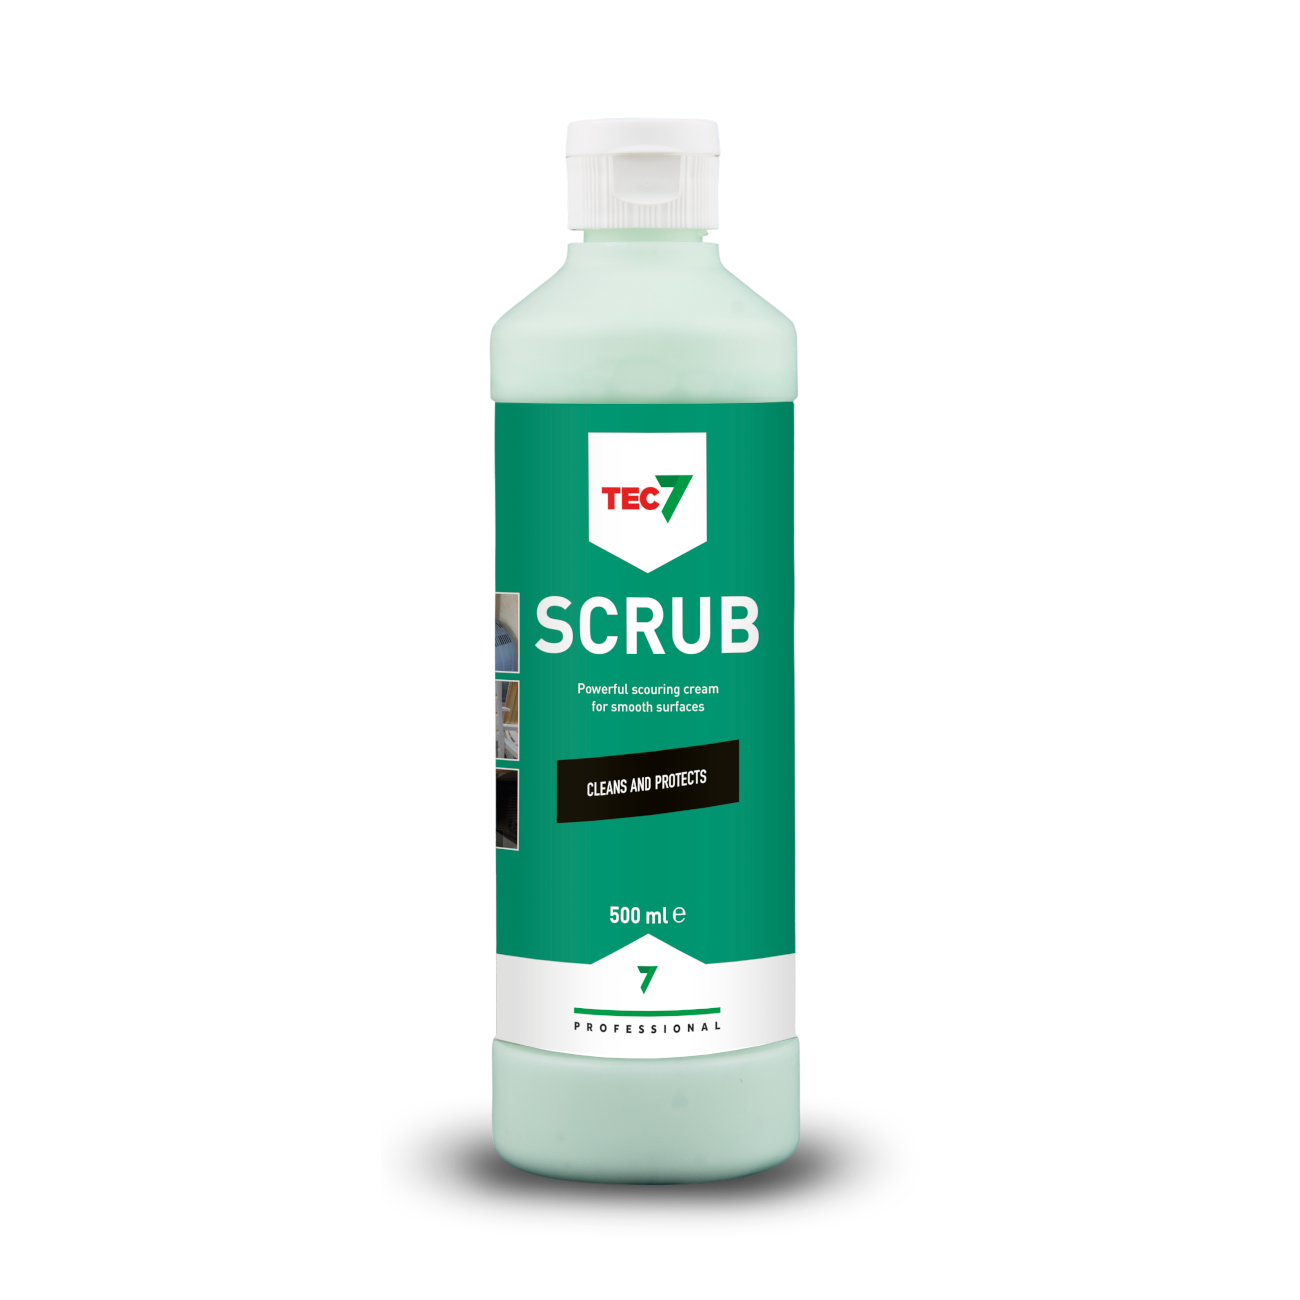 Tec7_Scrub-shop